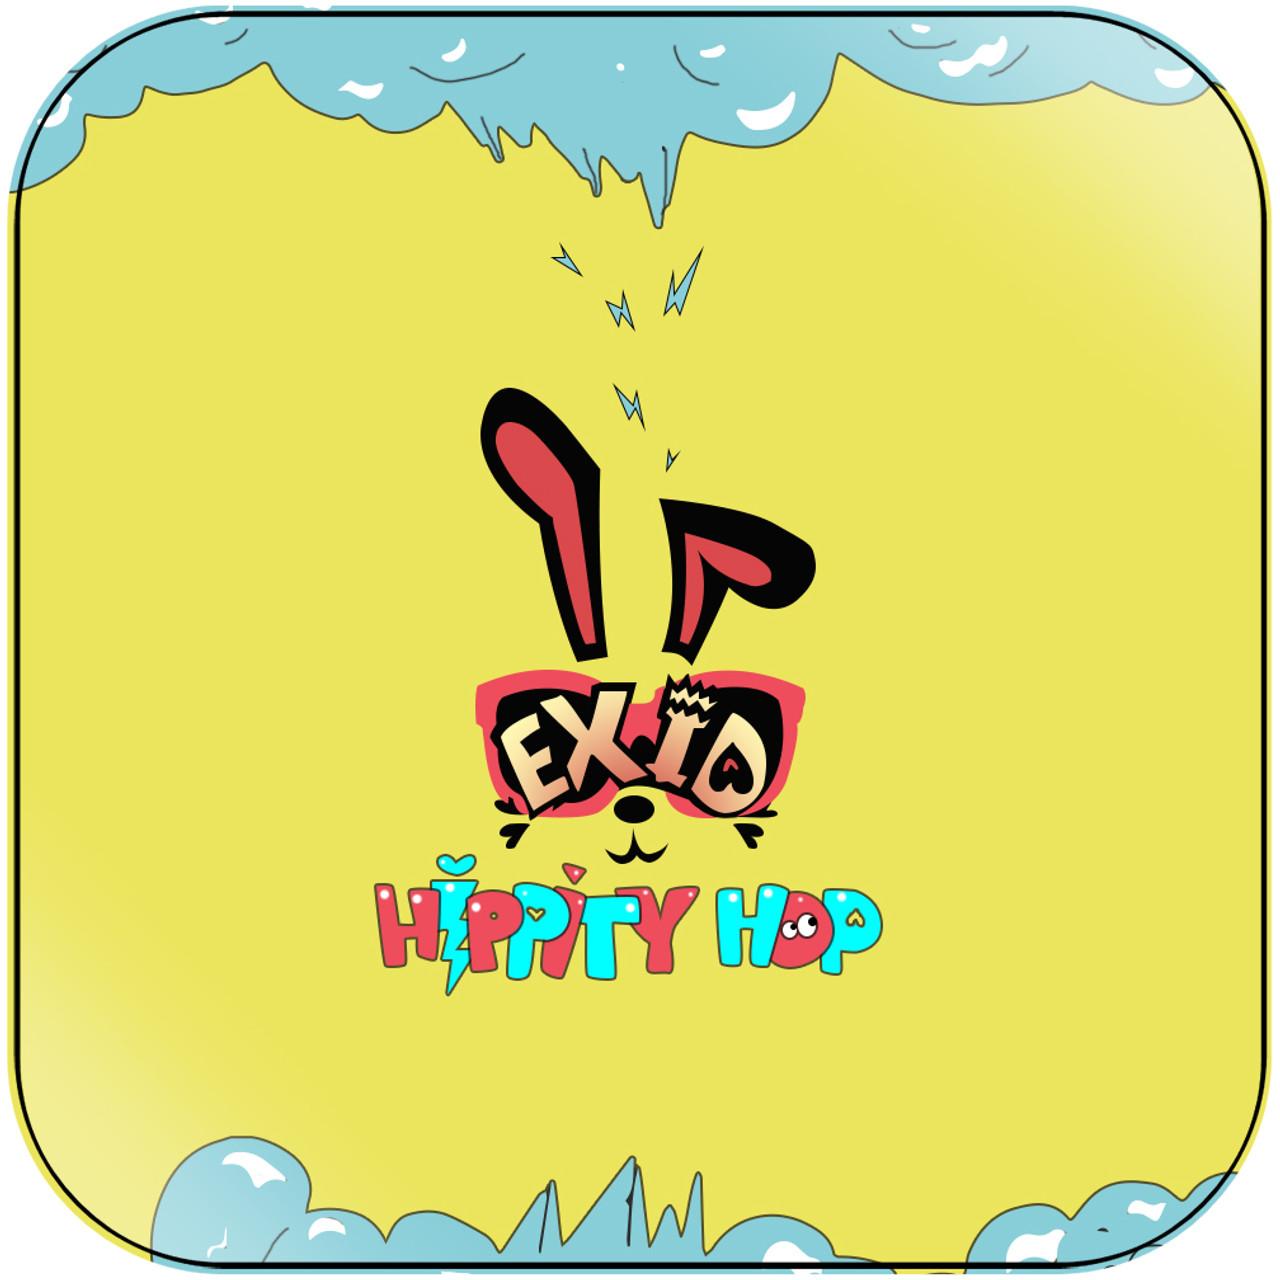 Hippity Hop >> Exid Hippity Hop Album Cover Sticker